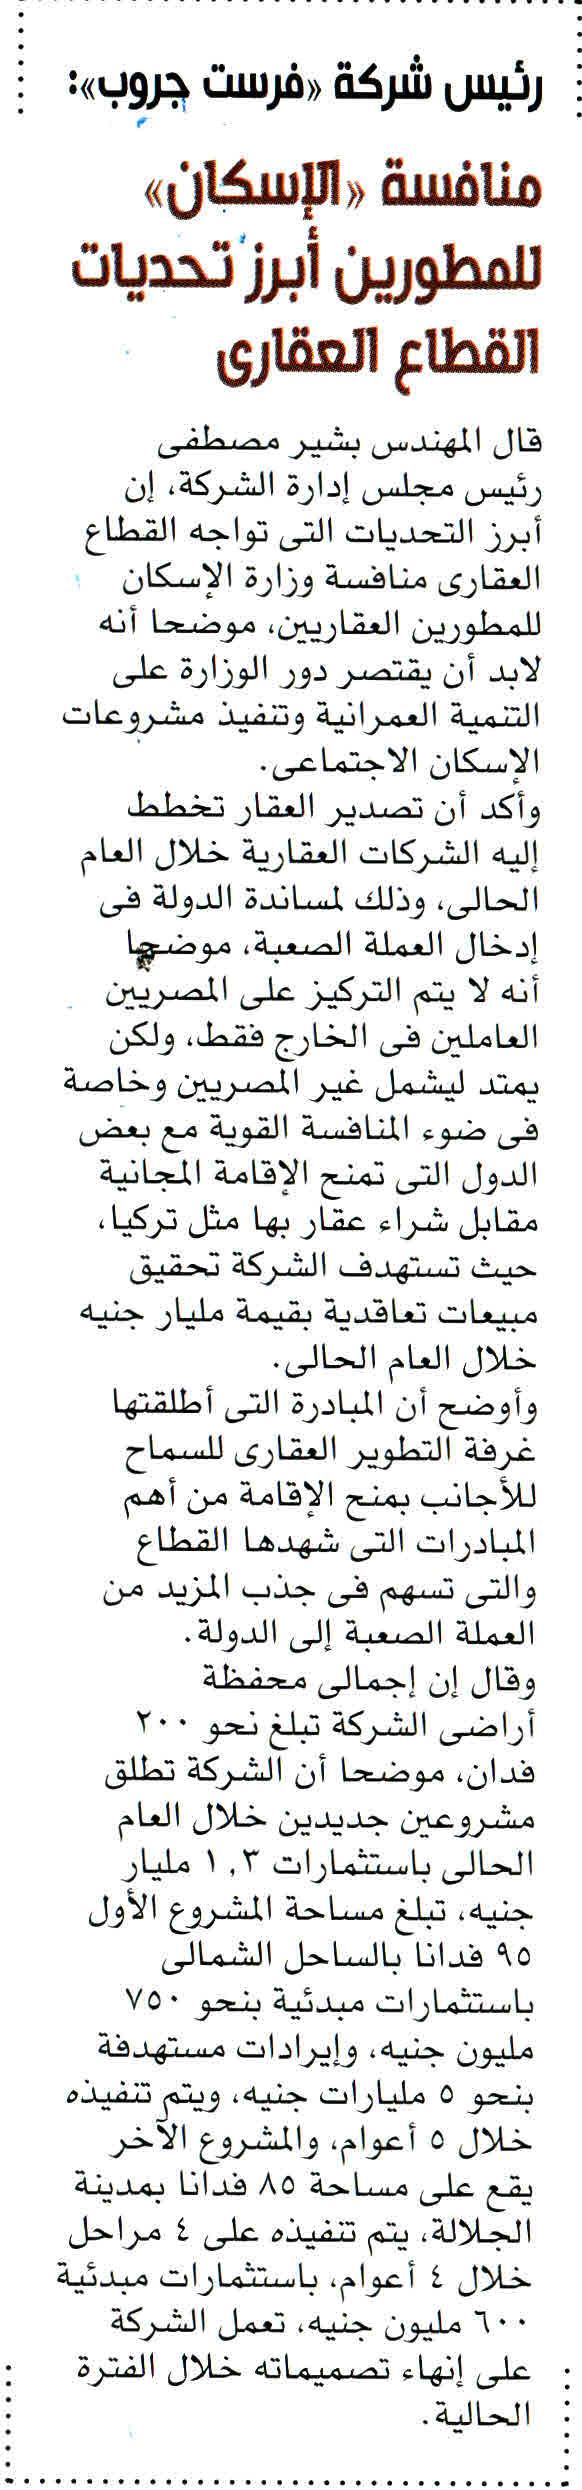 Al Ahram Al Iktisadi 28 Jan P.51 B.jpg